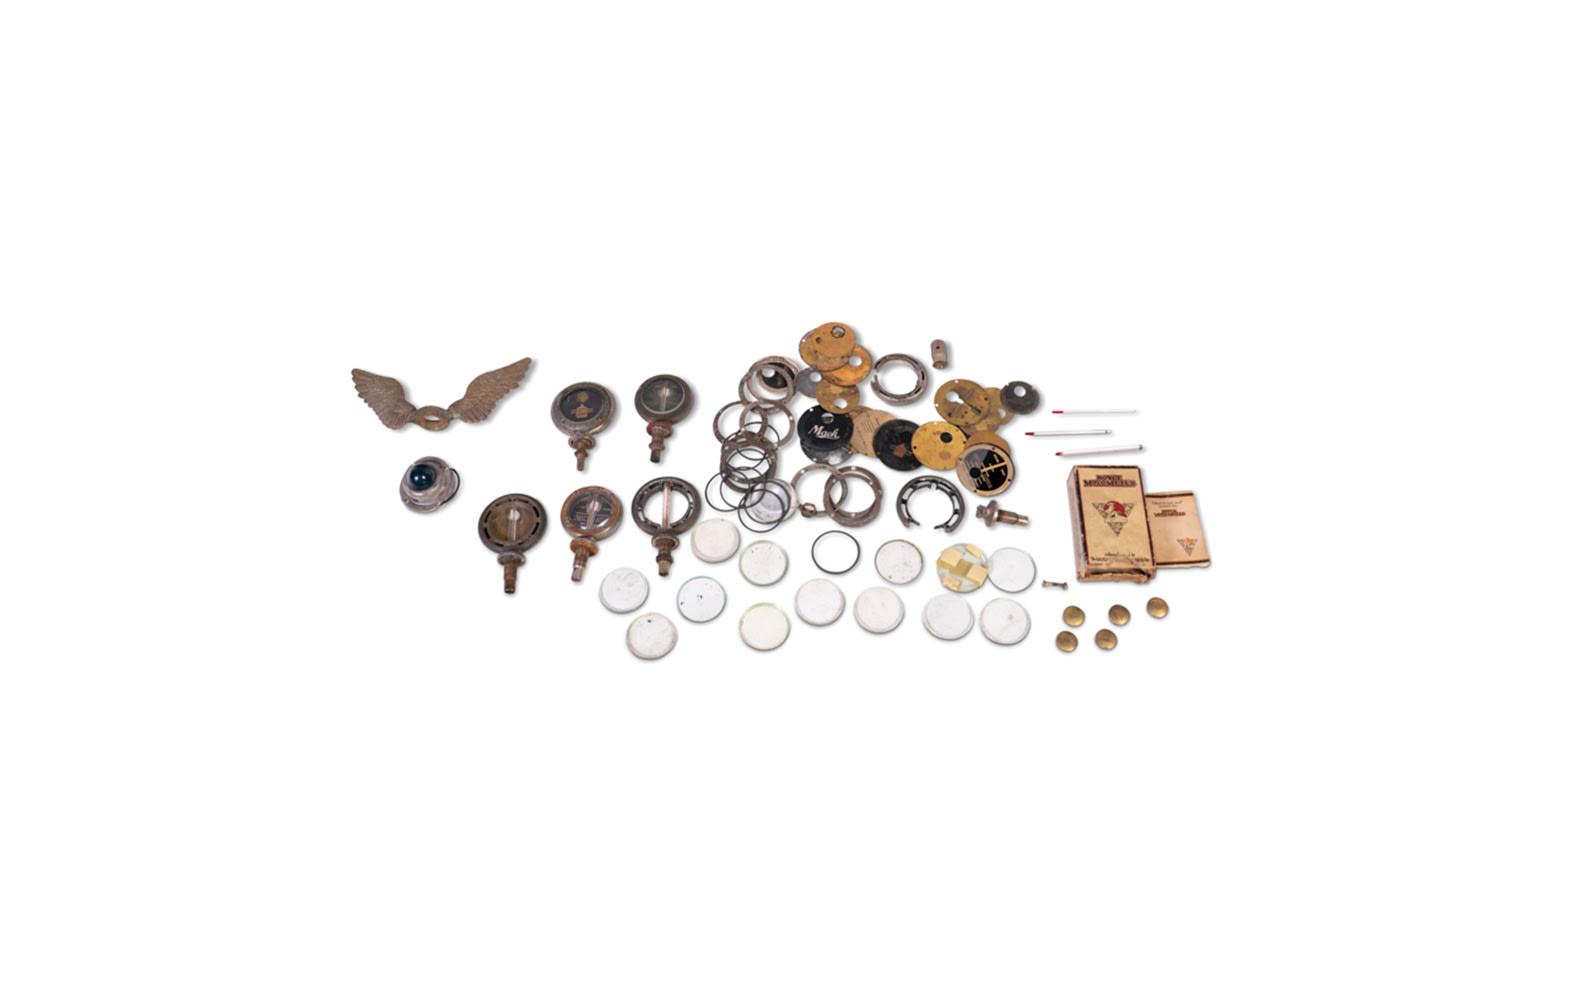 Prod/O21E - Phil Hill C 2021/C0057_Motometer Components and Parts/C0057_Motometer_Components_Parts_1_bjq5qx